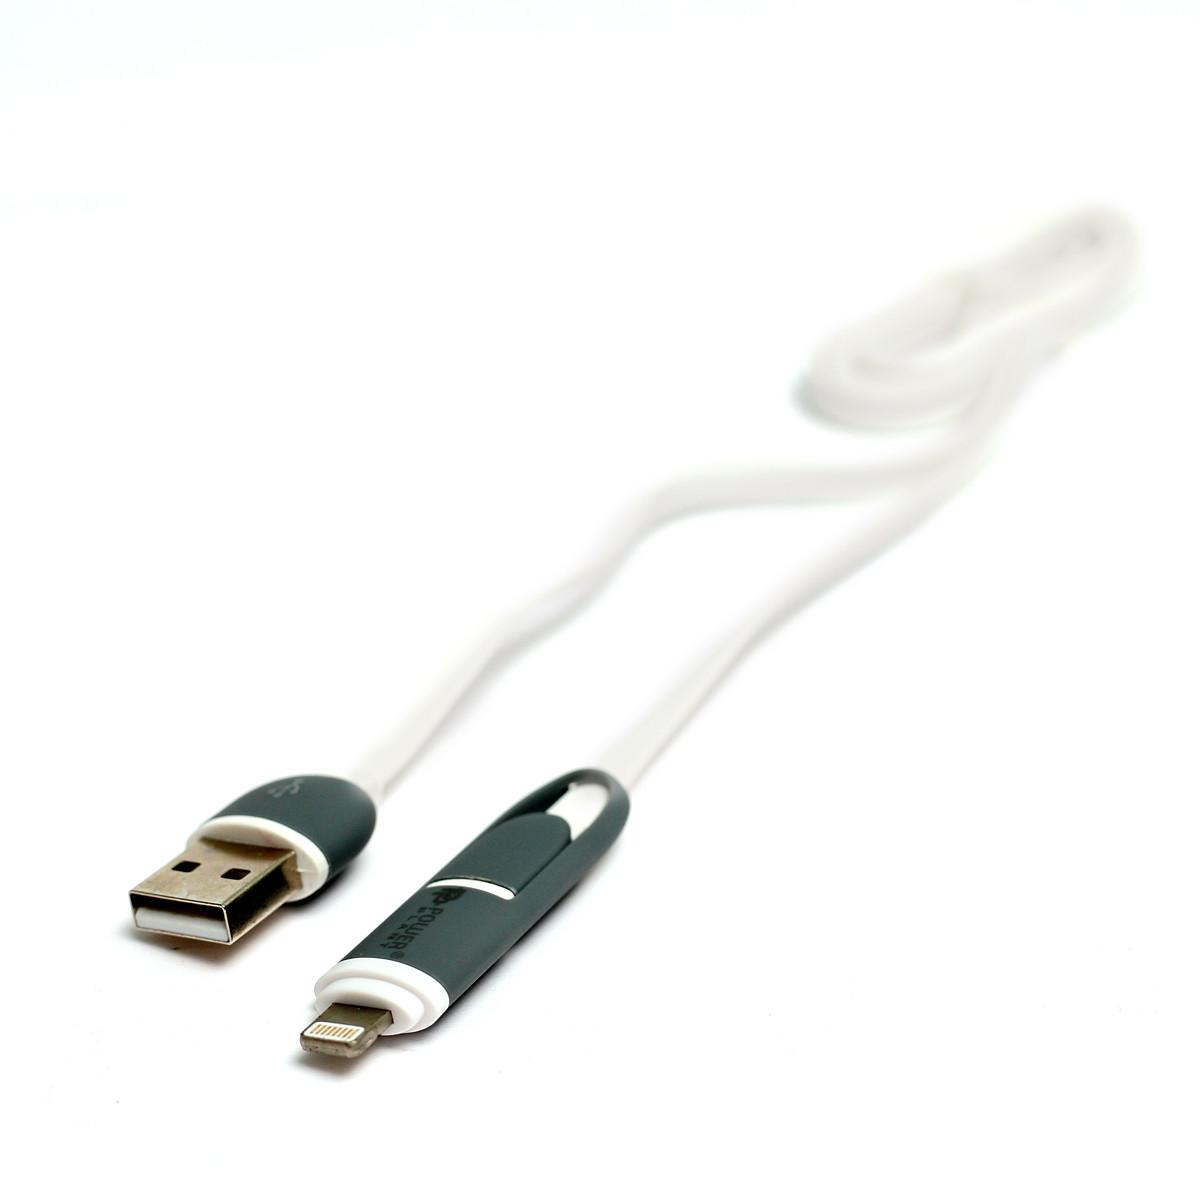 Kабель PowerPlant Quick Charge 2A 2-в-1 flat USB 2.0 AM – Lightning/Micro 1мwhite